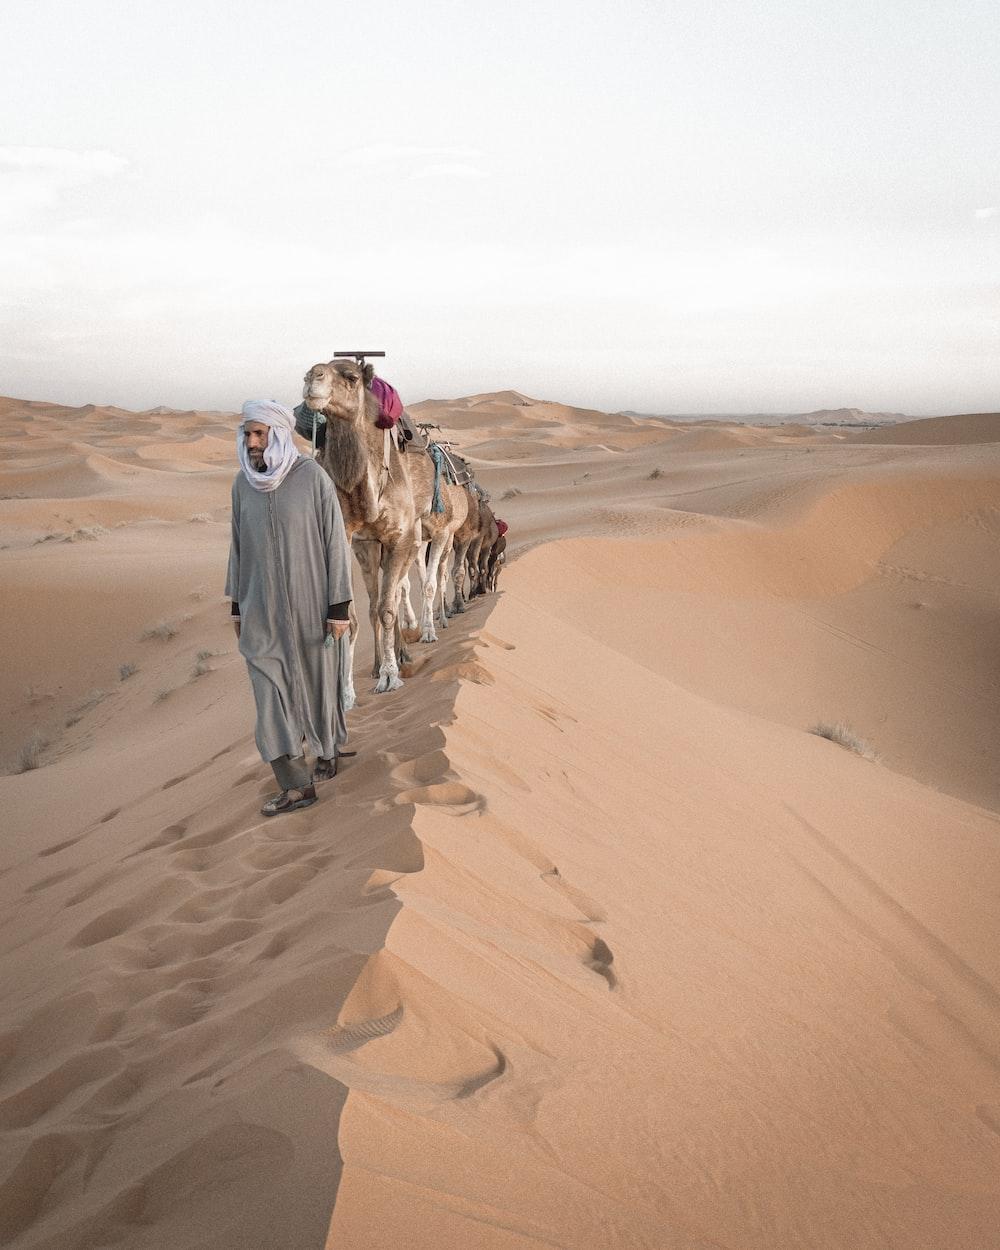 2 men walking on desert during daytime